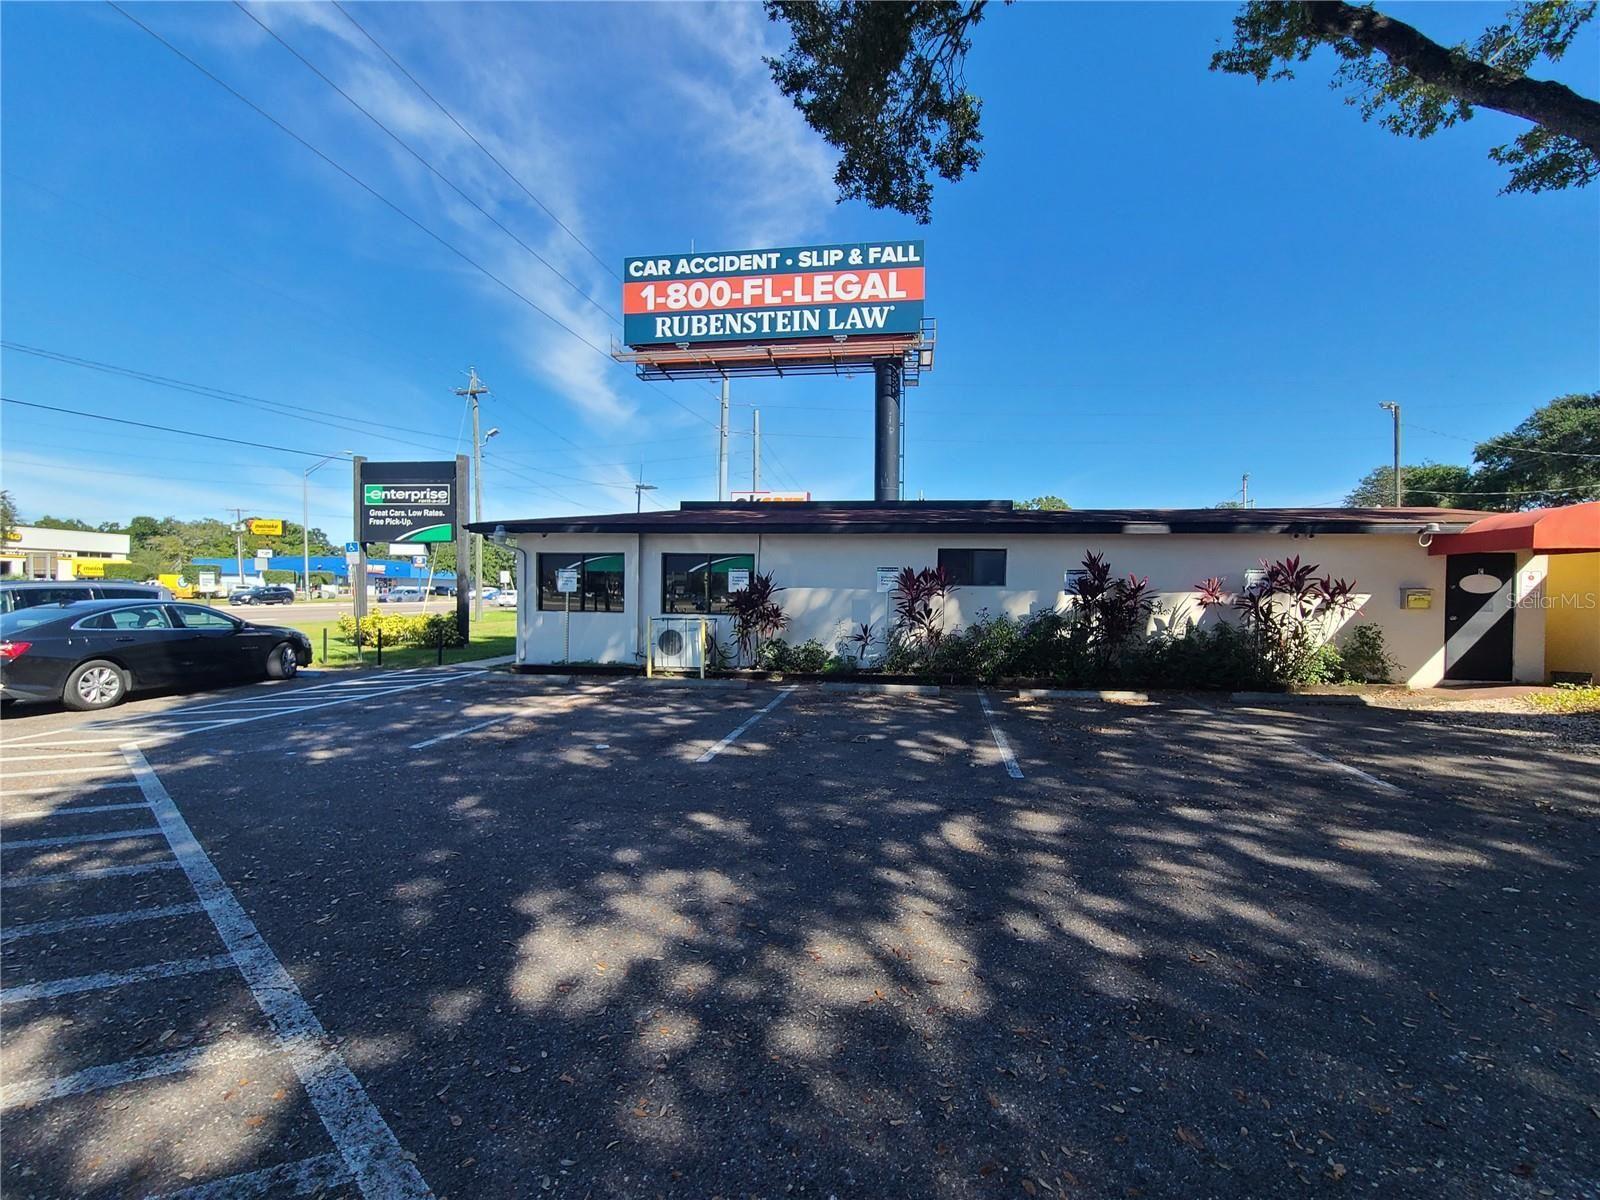 6845 N DALE MABRY HIGHWAY #A, Tampa, FL 33614 - #: U8139313